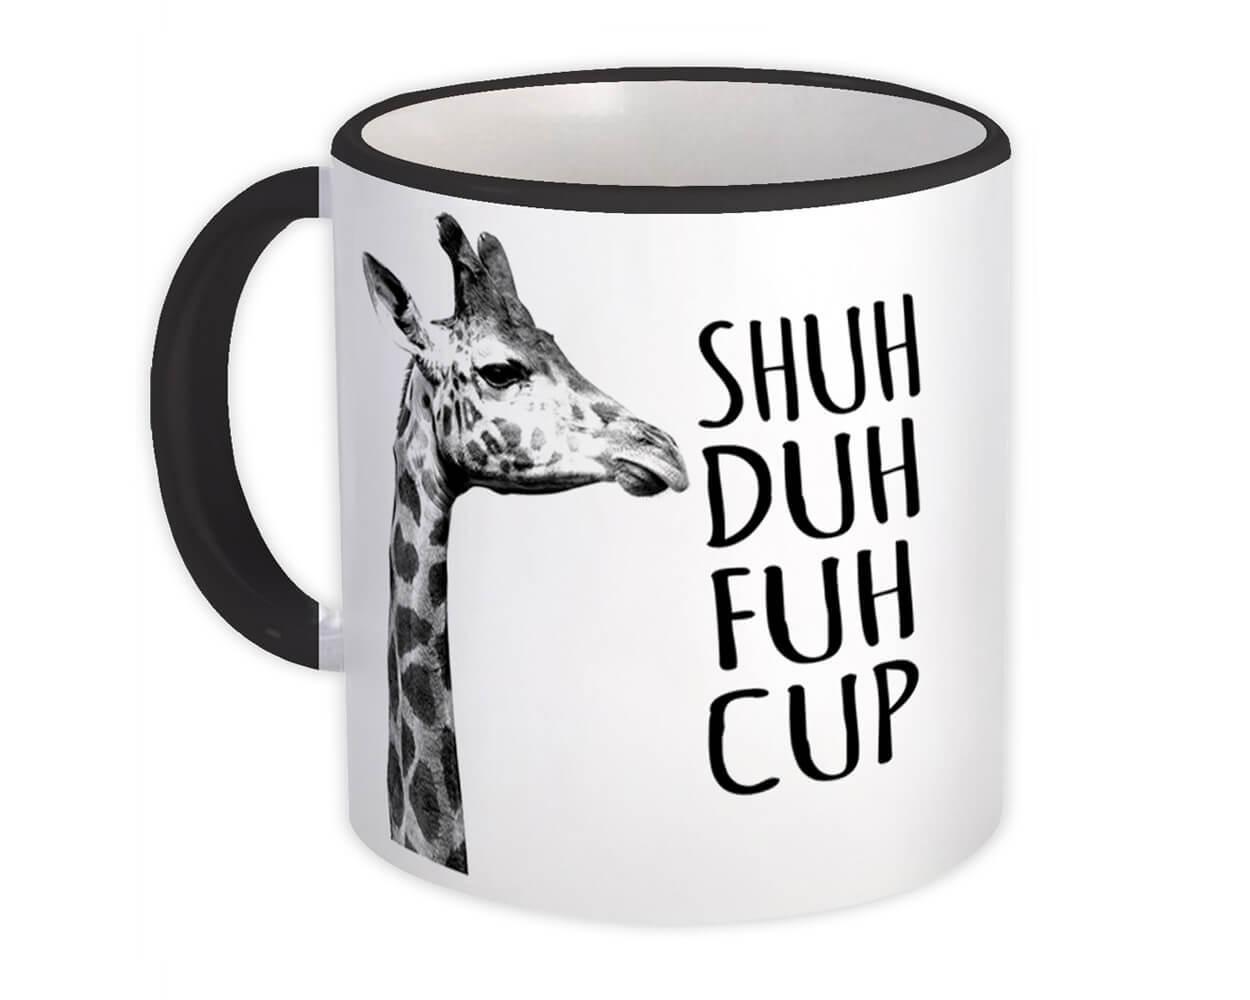 Shuh Duh Fuh Cup : Gift Mug Giraffe Animal Funny Office Coworker